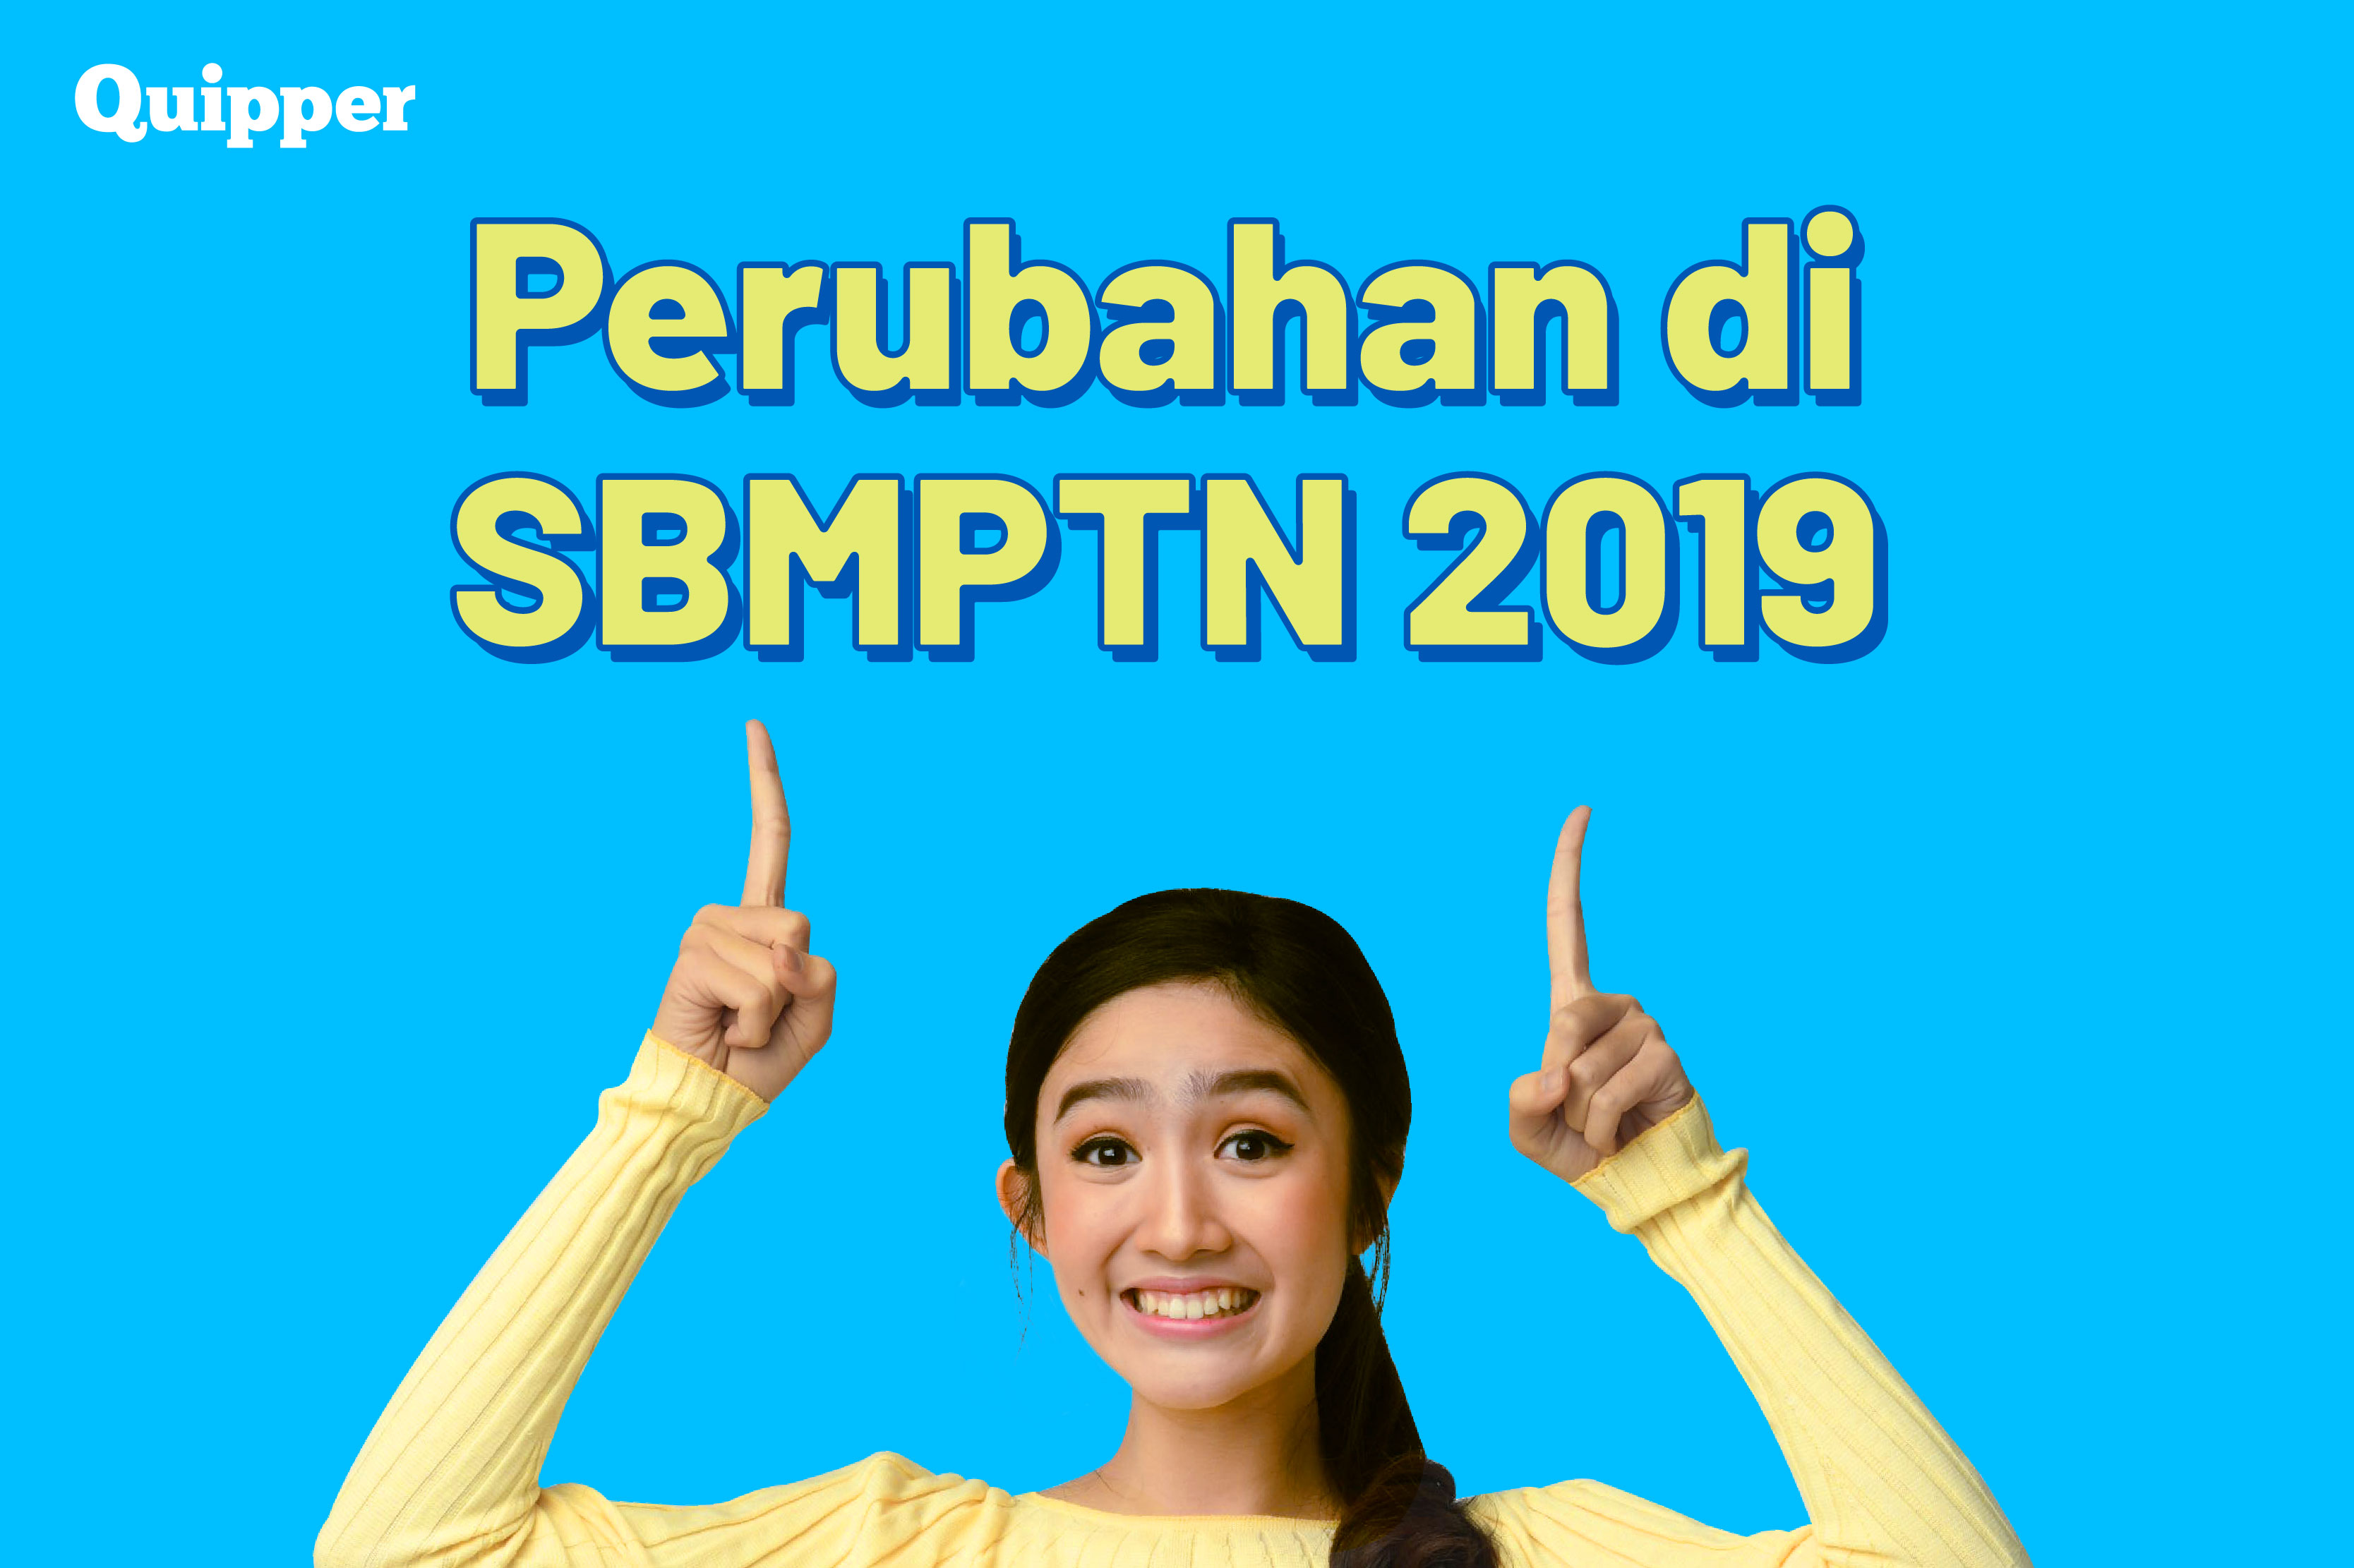 Kenali Semua Perubahan Penting di SBMPTN 2019 Nanti!